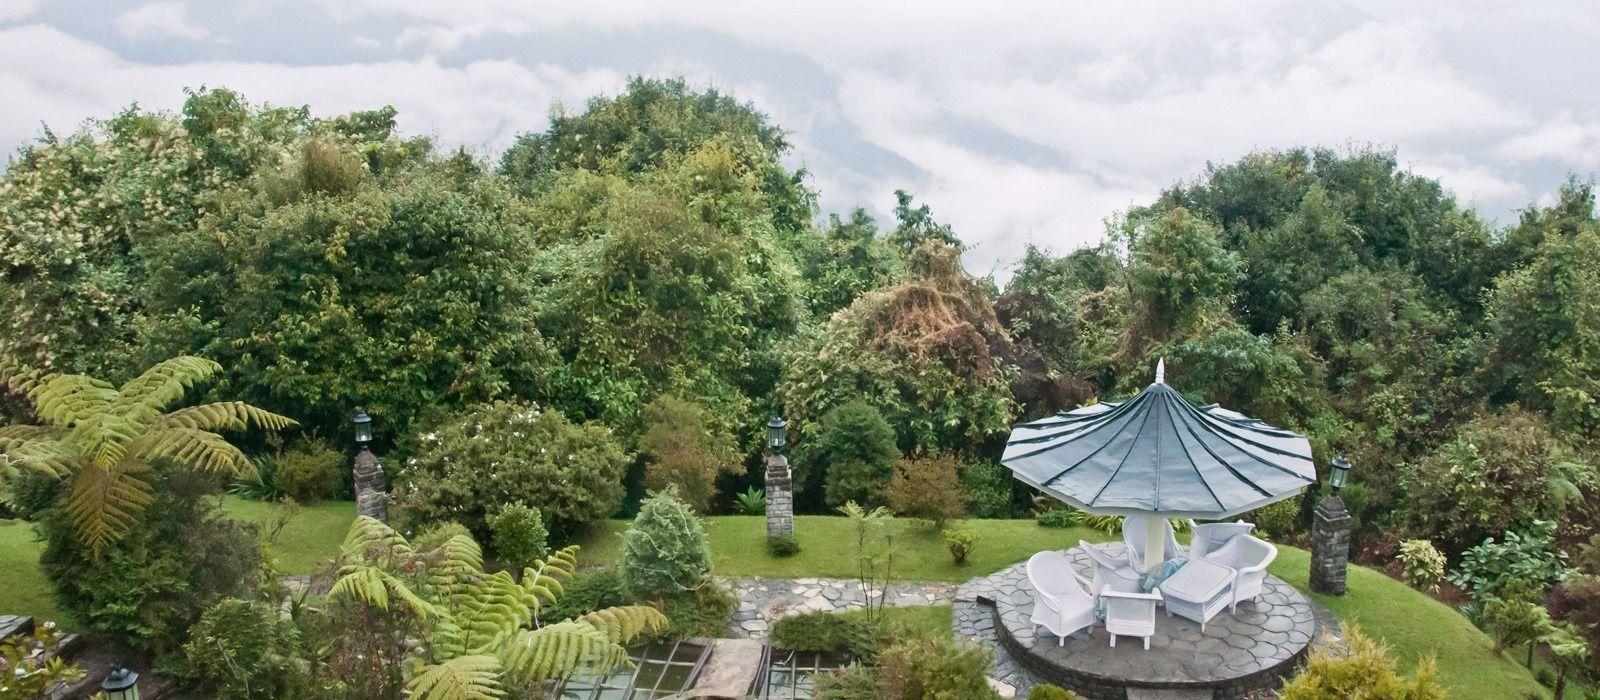 Darjeeling: Teegenuss & Berge Urlaub 2